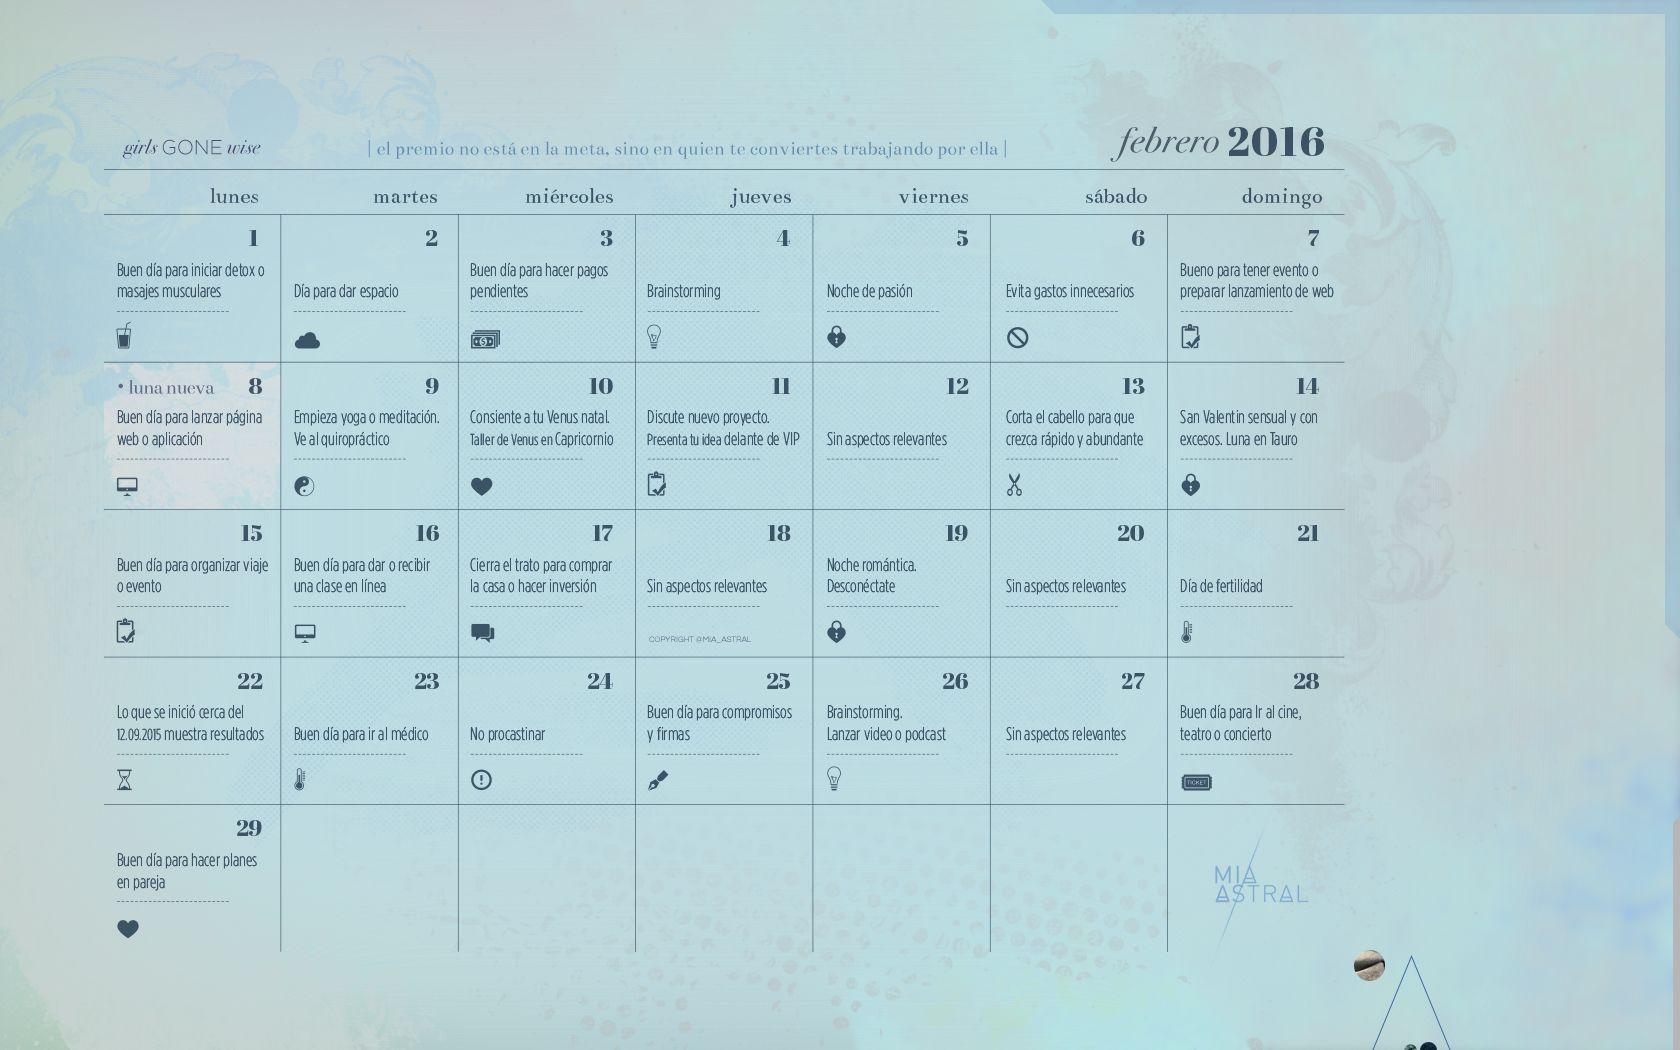 Calendario-Febrero-Web.jpg (1680×1050)